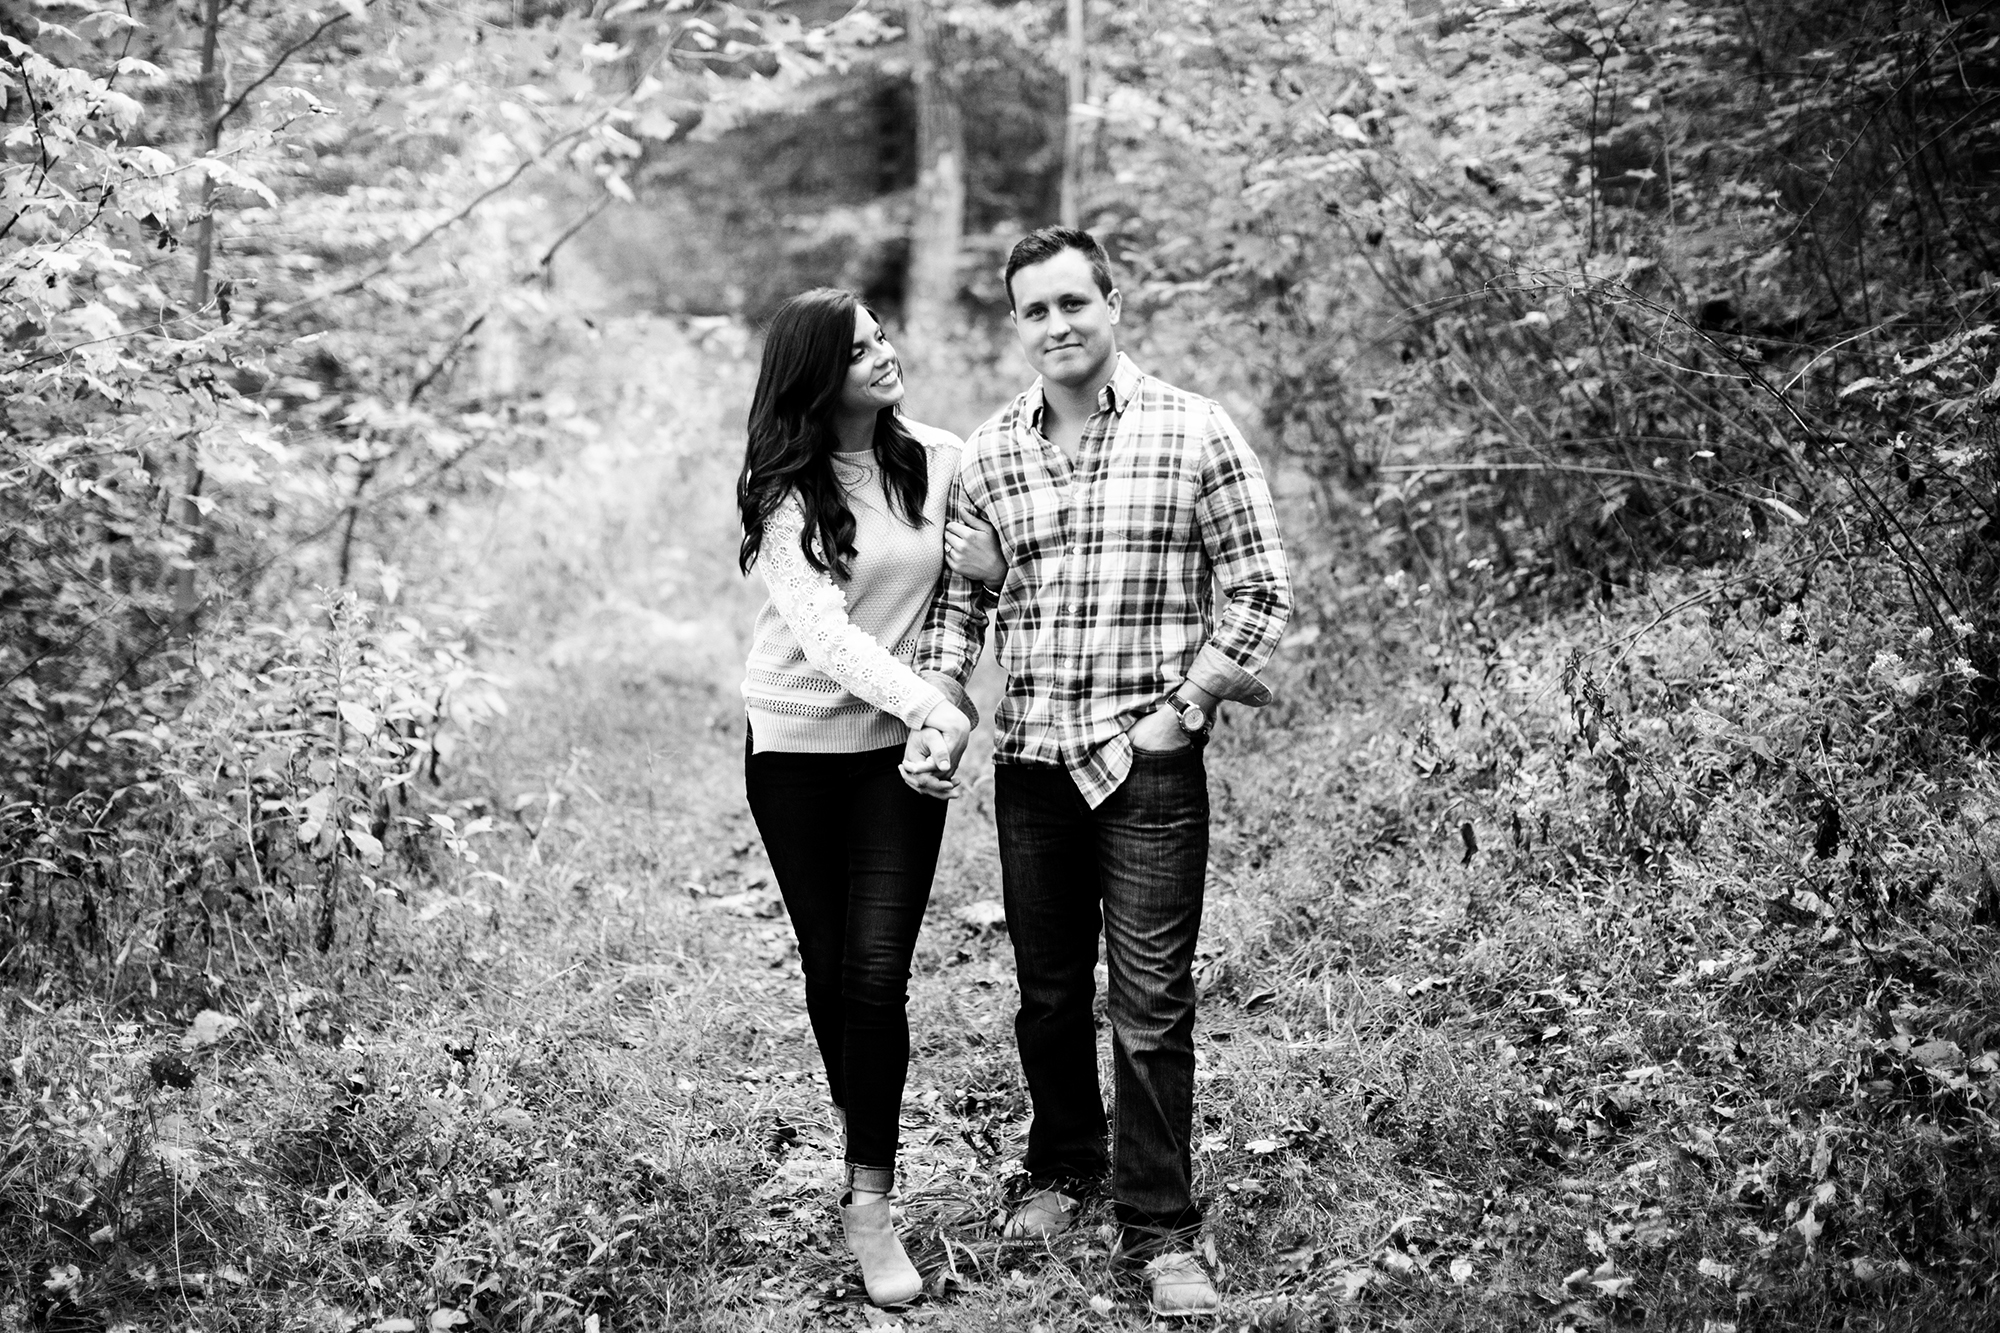 Seriously_Sabrina_Photography_Bernheim_Forest_Engagement_JB025.jpg